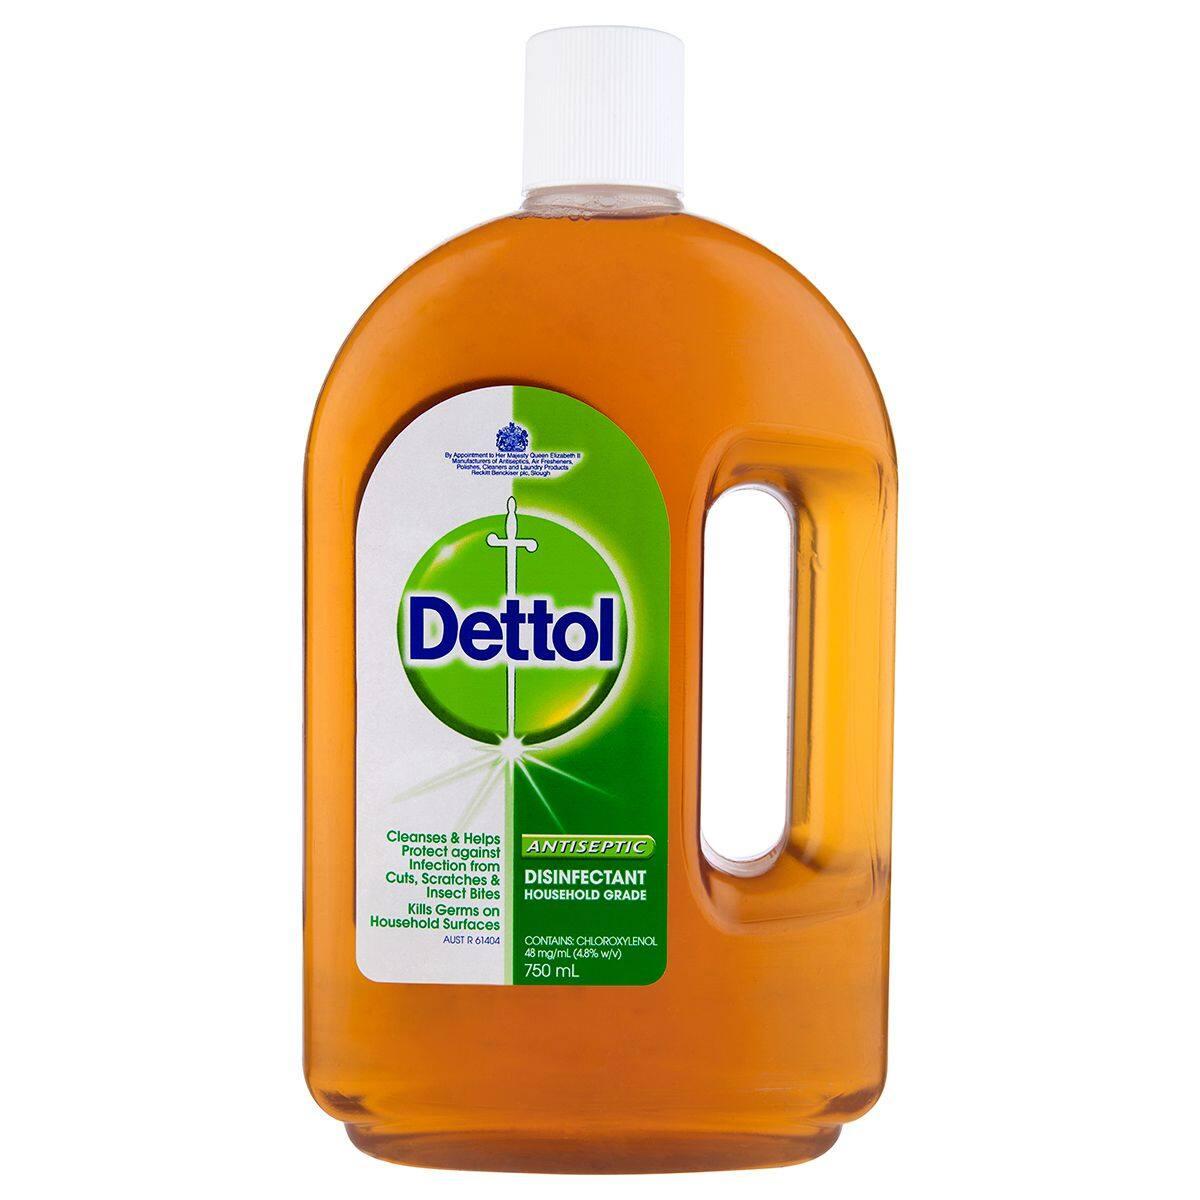 Dettol Antiseptic Liquid 750ml (READY STOCK) 1 BOTTLE